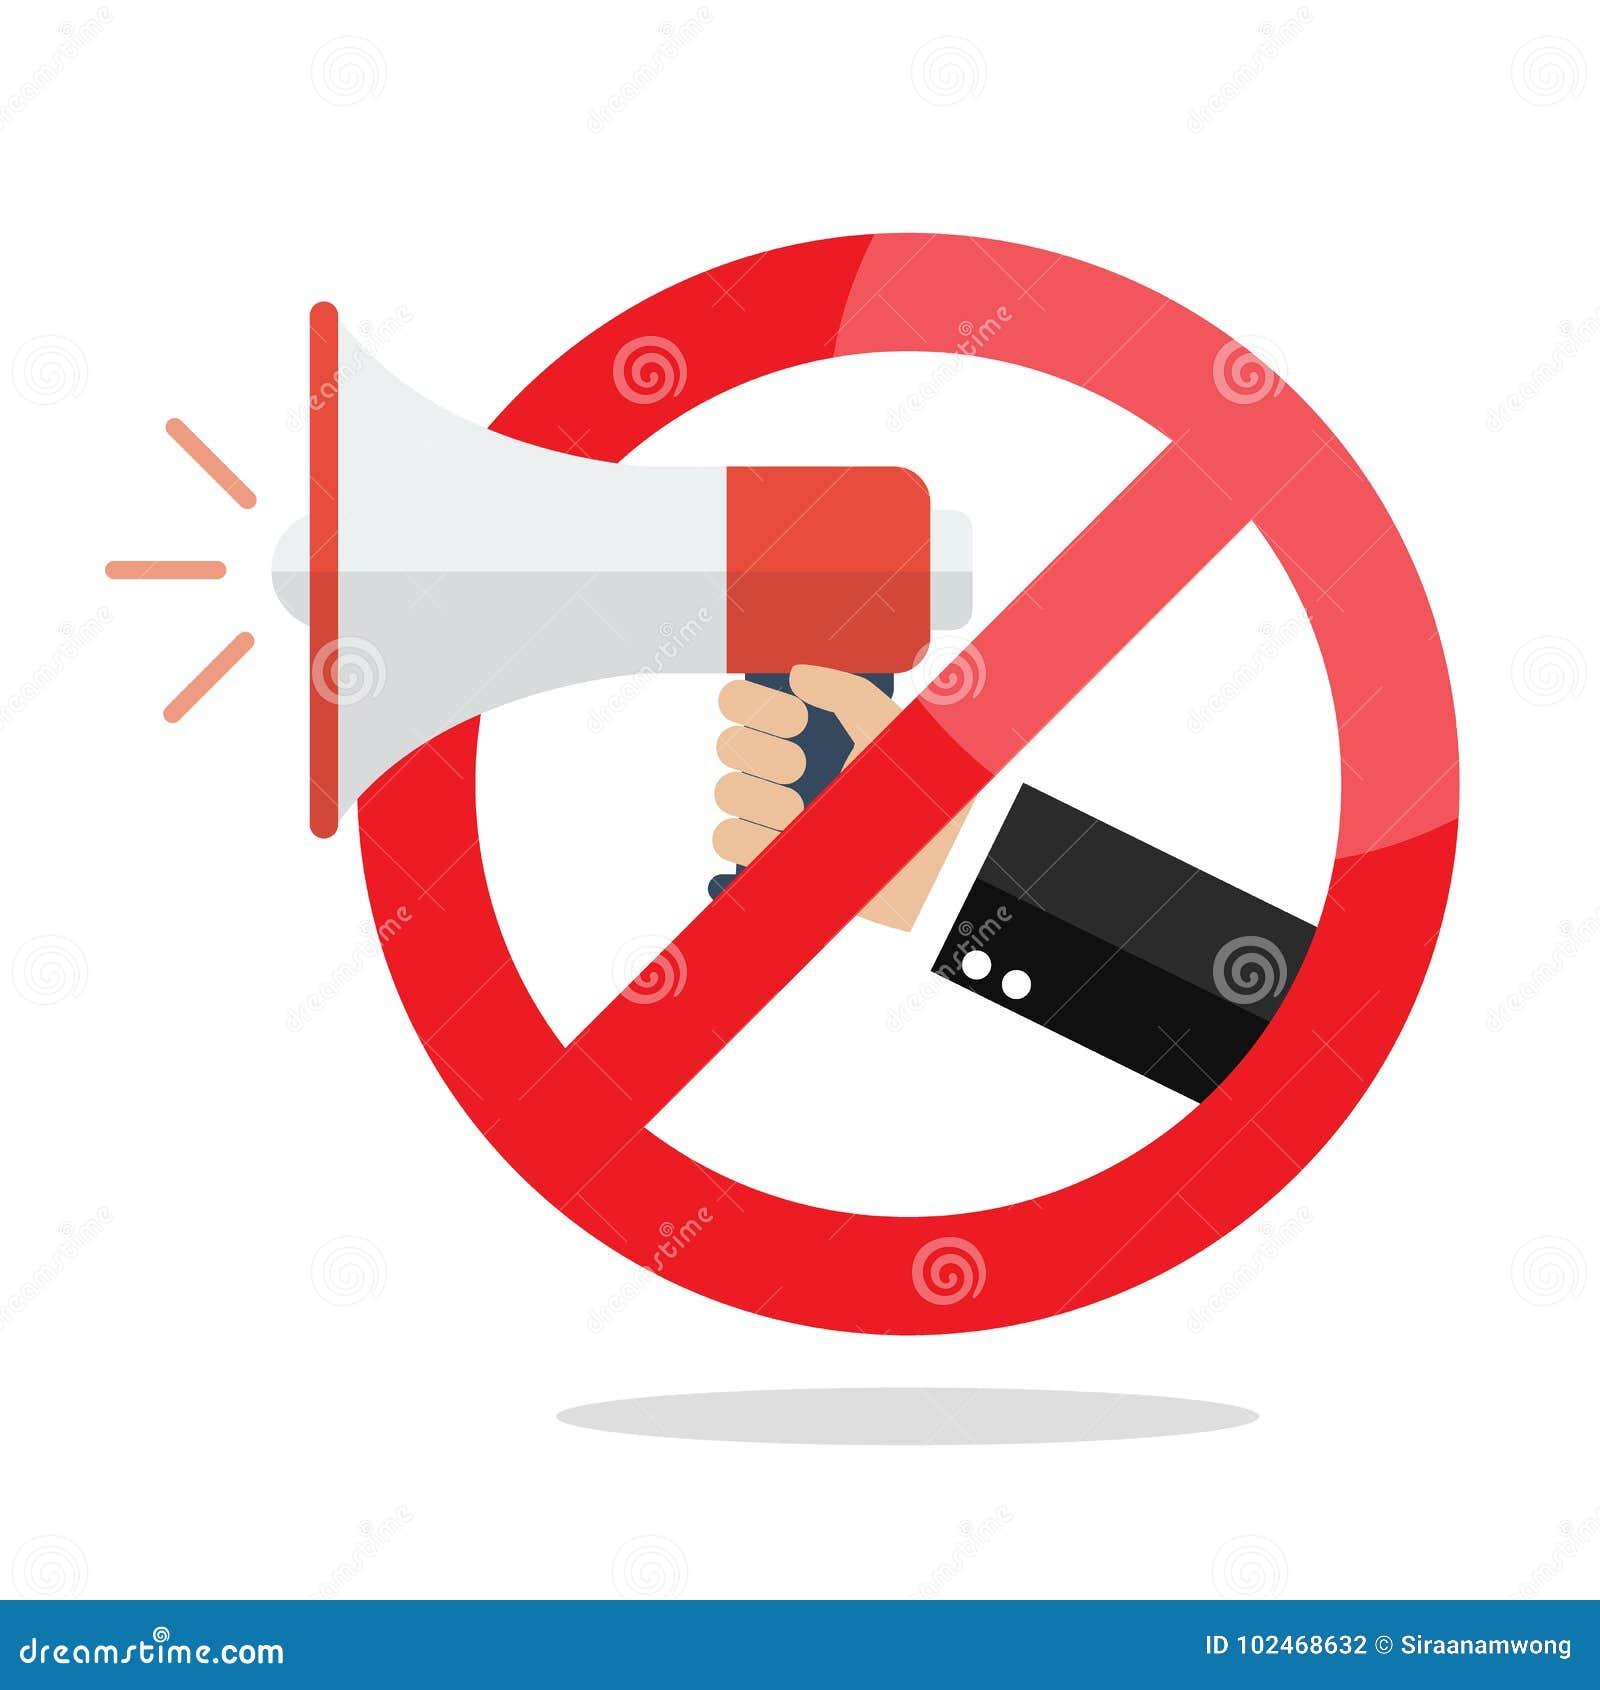 No megaphone or no speaker prohibition sign